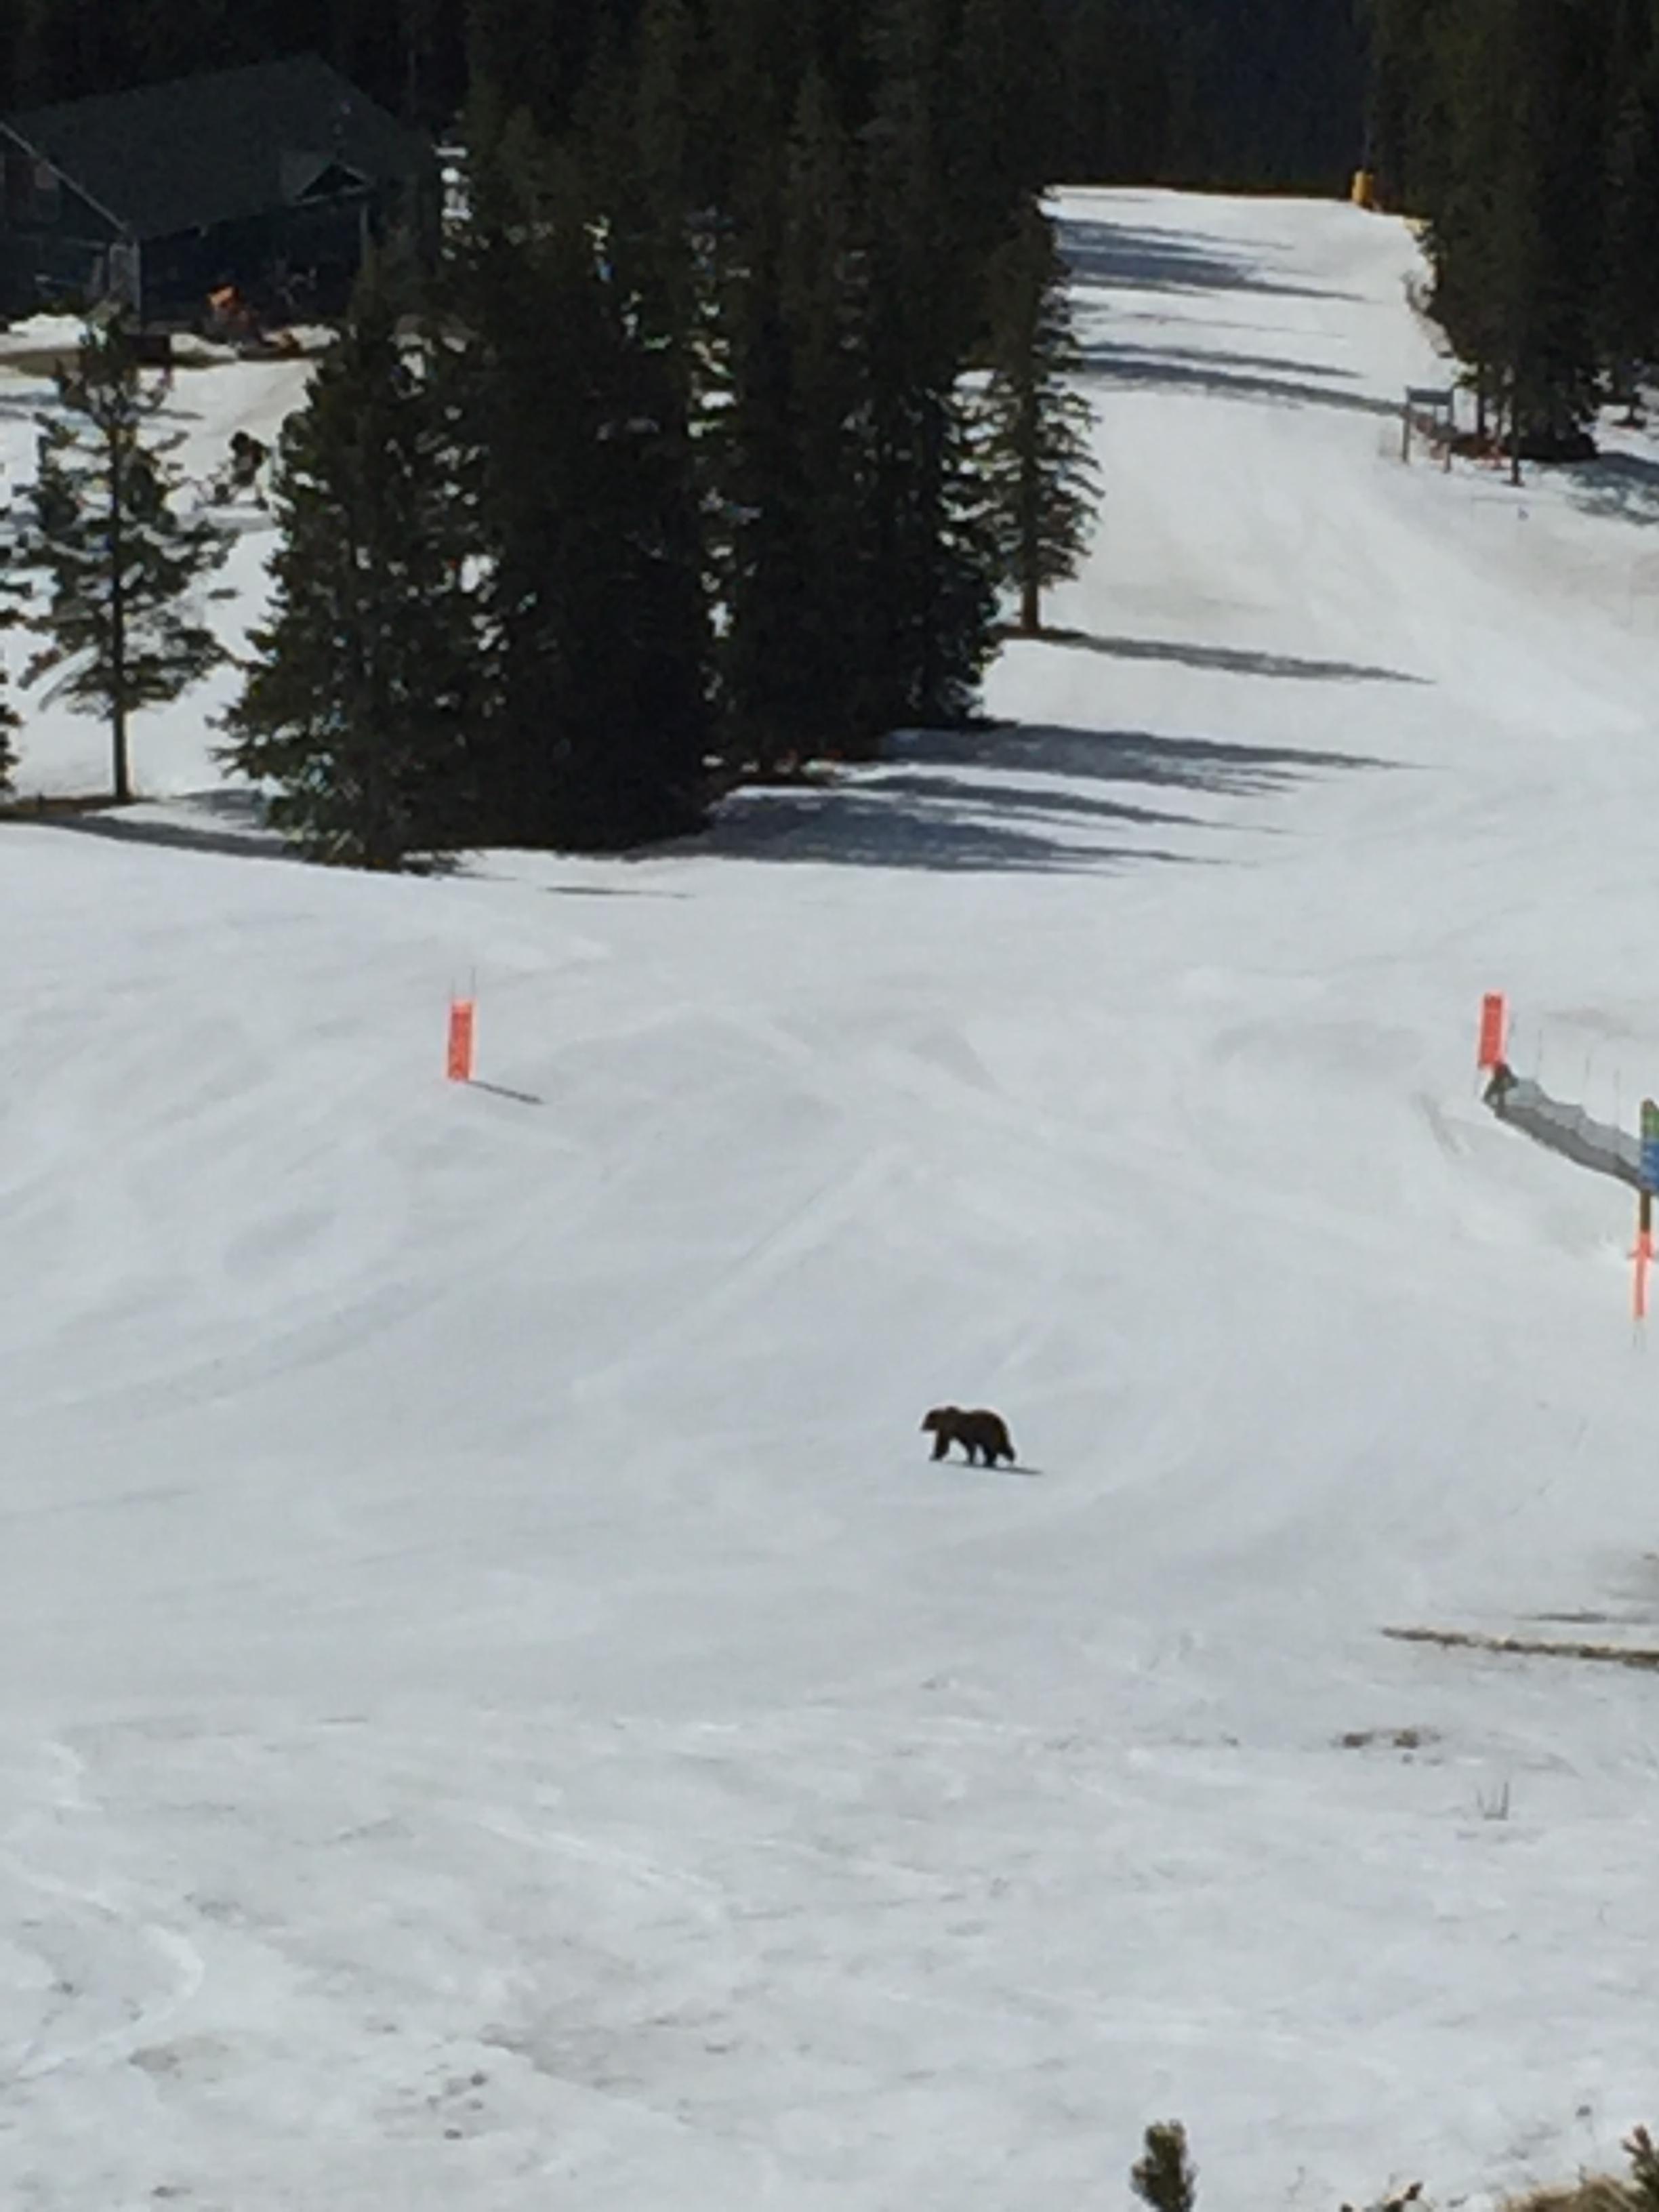 Grizzly bear on a run at the Lake Louise Ski Resort/Lake Louise